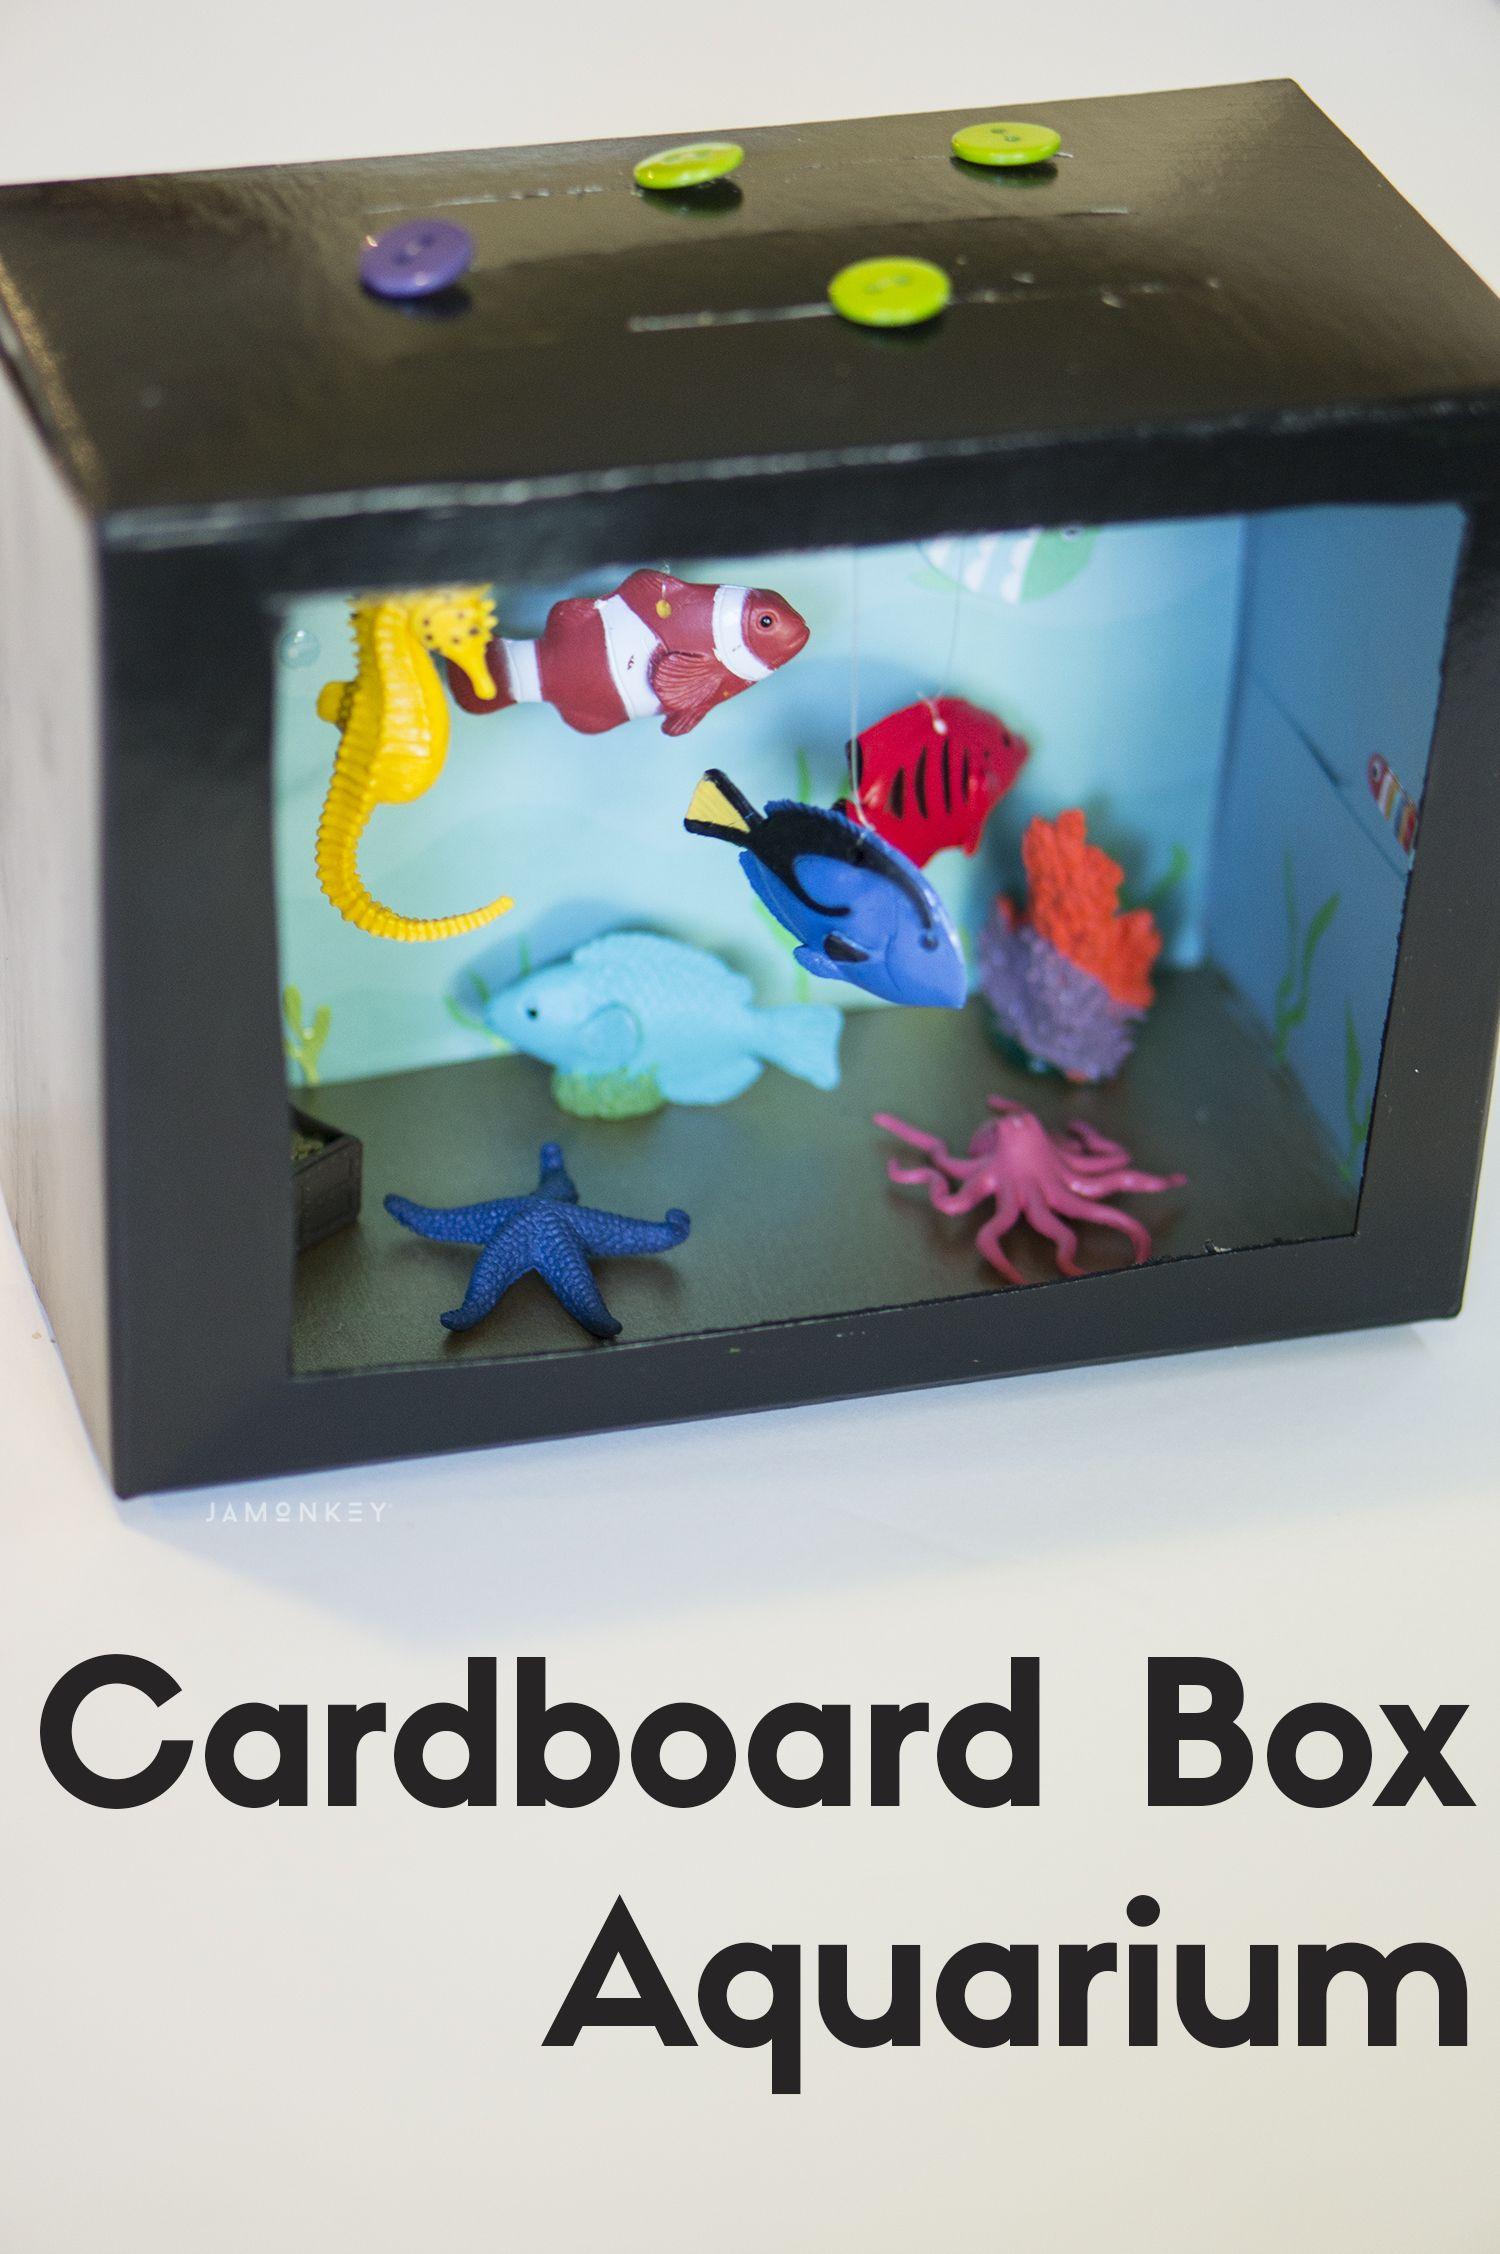 Cardboard box aquarium cardboard boxes aquariums and box for Cardboard for projects